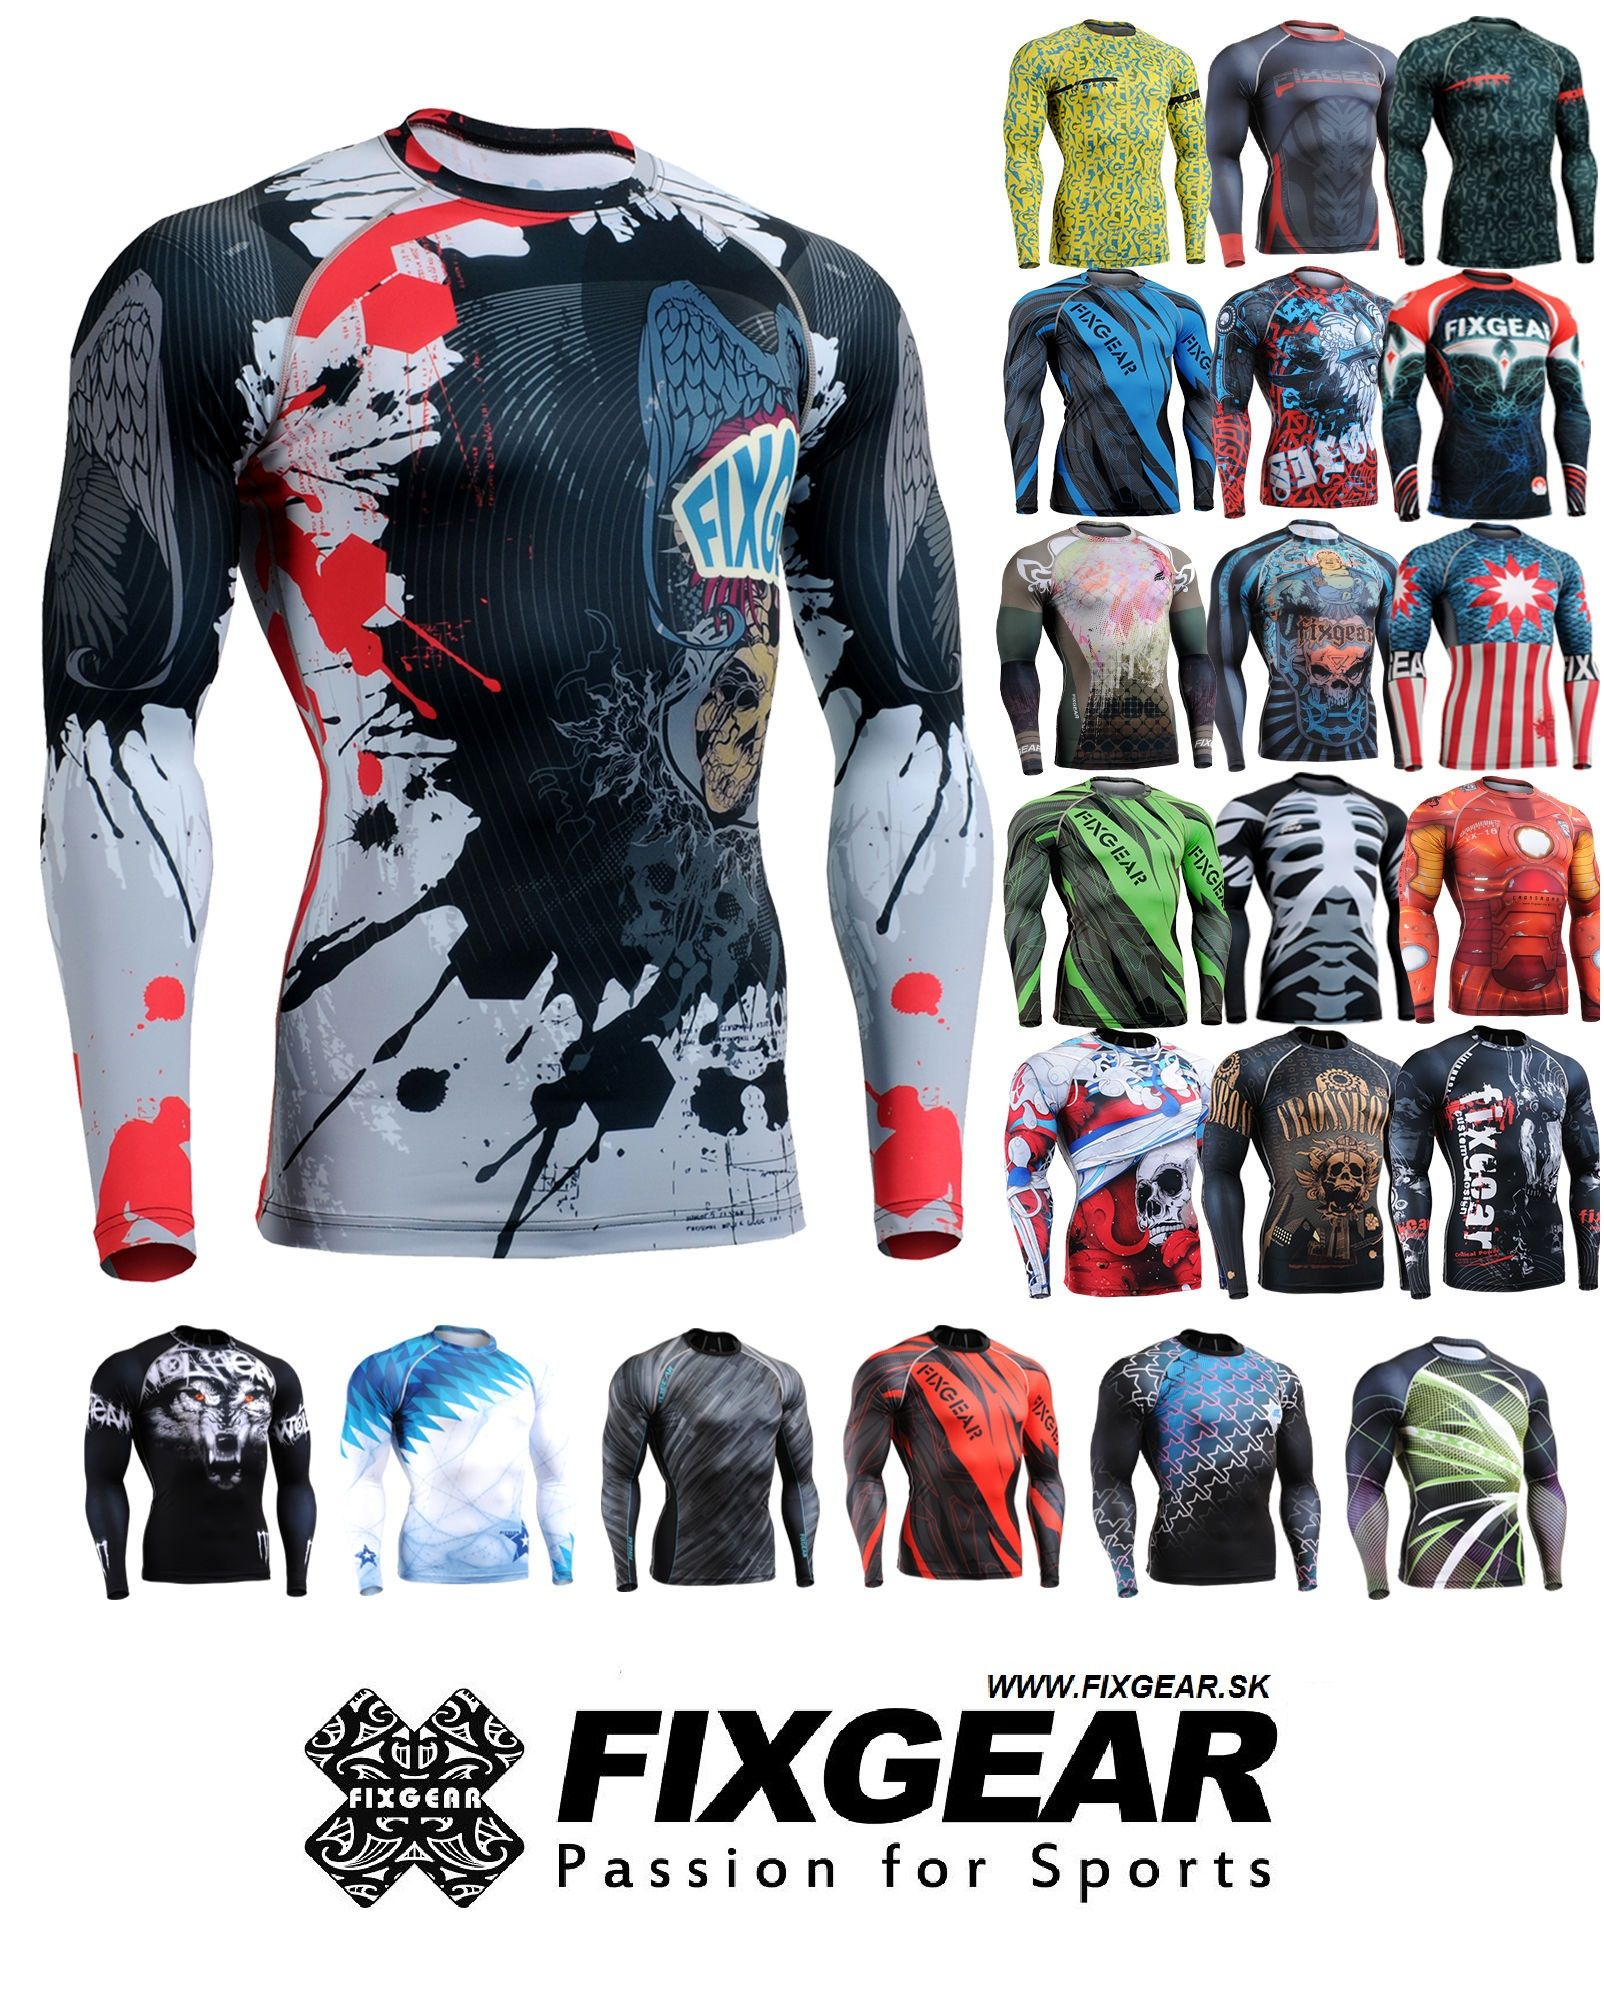 2475a2bdc UNISEX - kompresné tričká FIXGEAR FIXGEAR - Vášeň pre šport ...